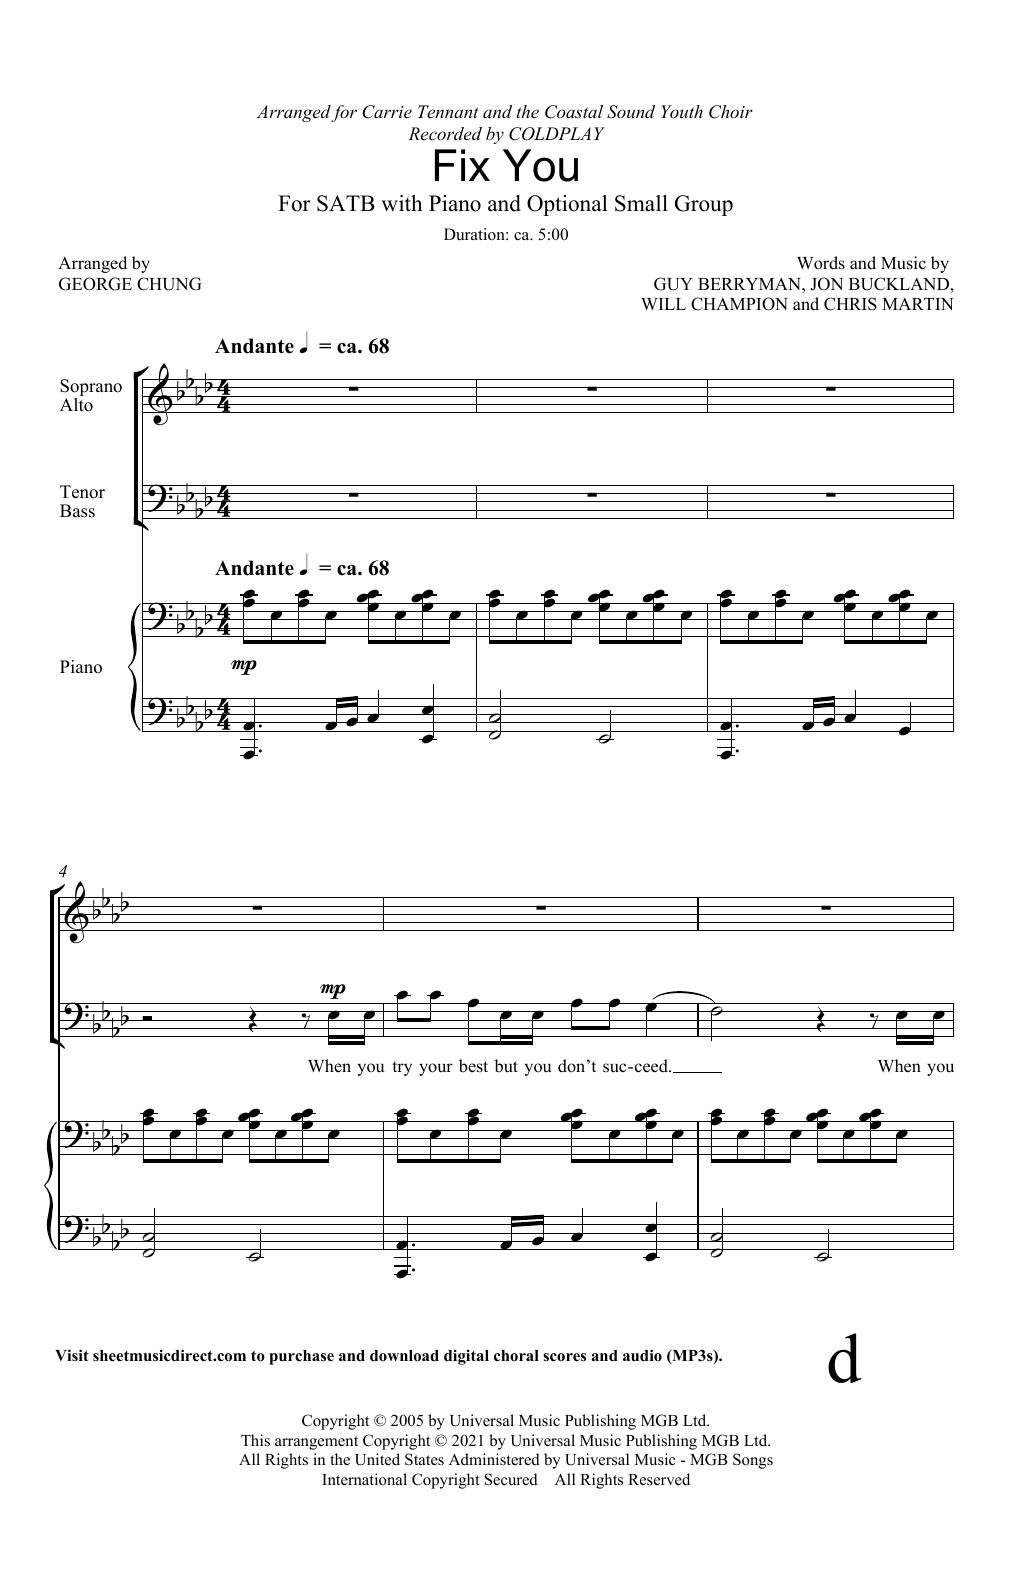 Fix You (arr. George Chung) Sheet Music